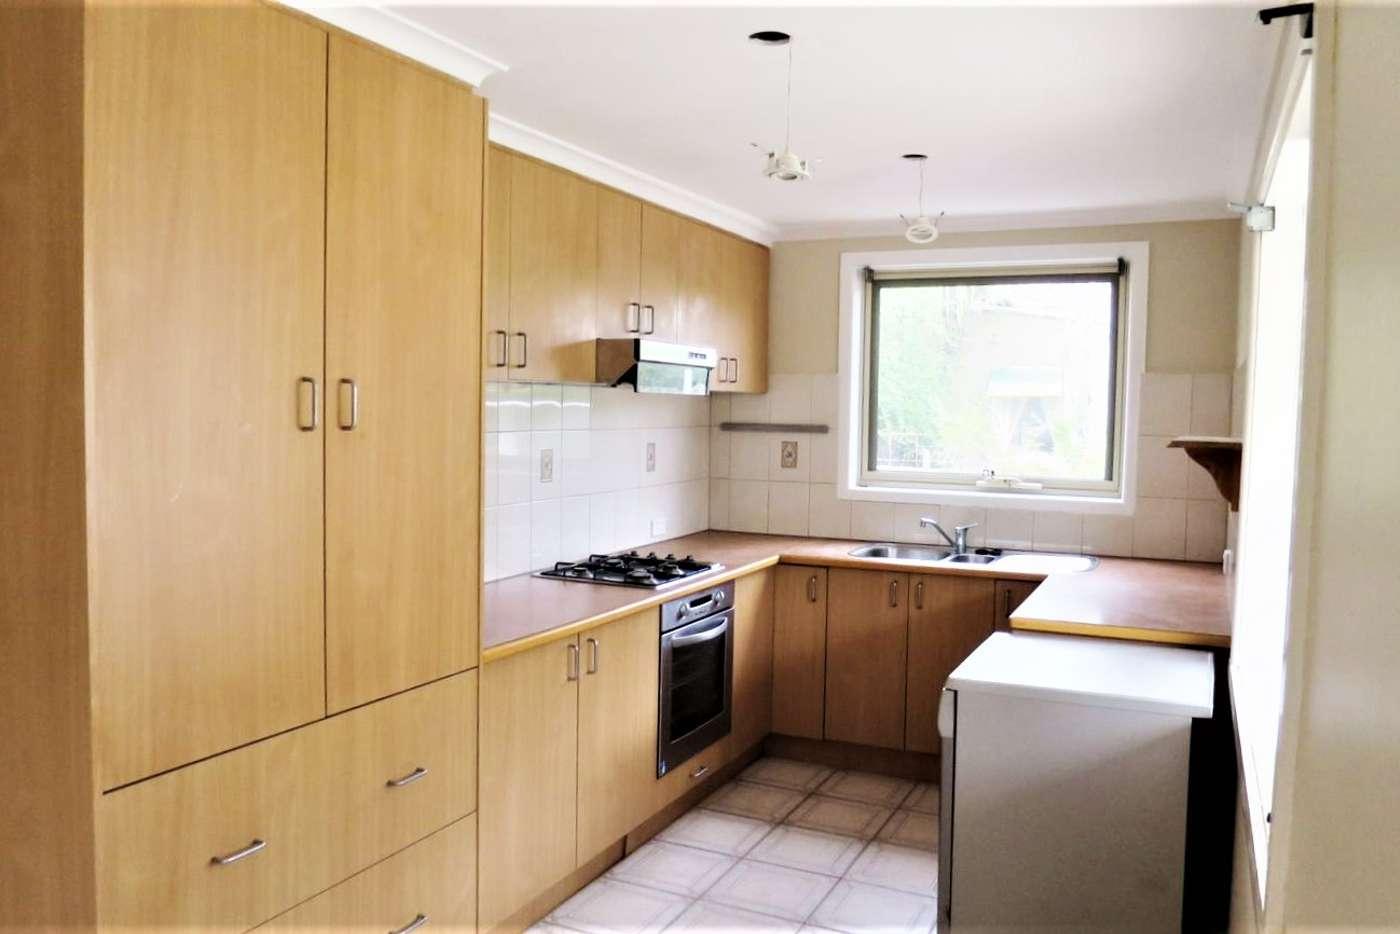 Sixth view of Homely house listing, 3 Devon Street, Preston VIC 3072